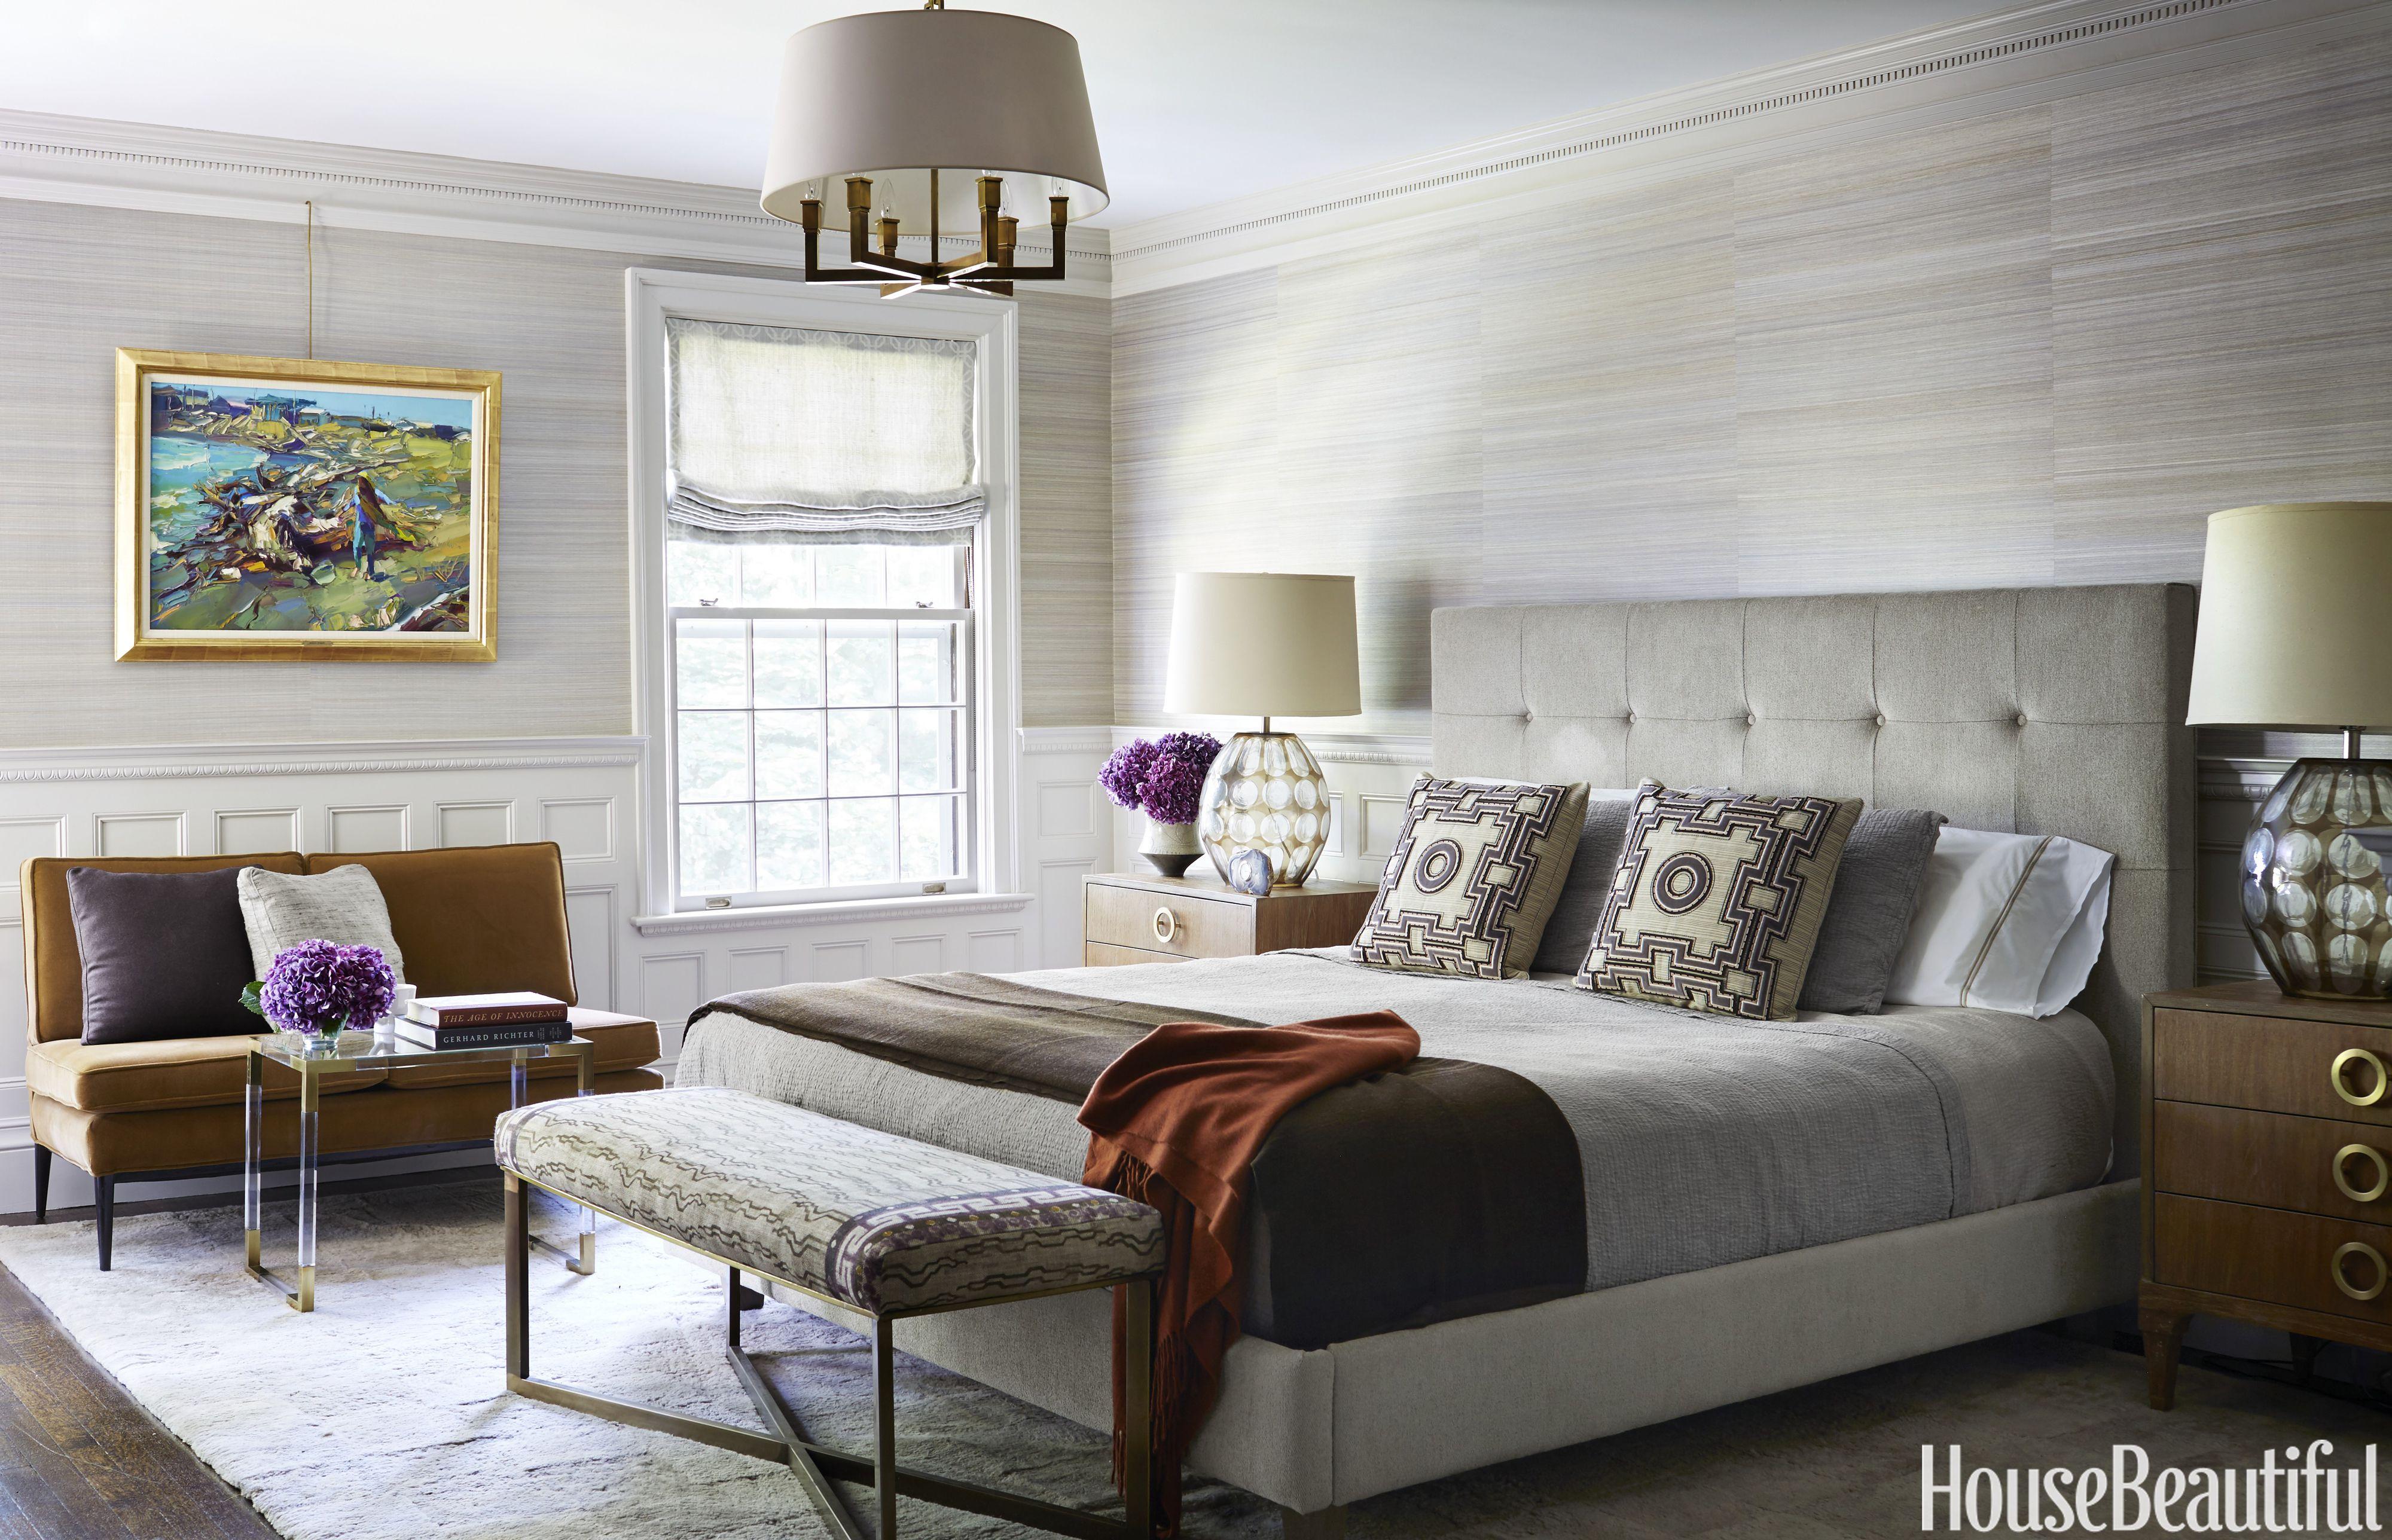 Designer Bedroom 100 Stylish Bedroom Decor Ideas - Modern Bedroom Design Tips MMKOKDW